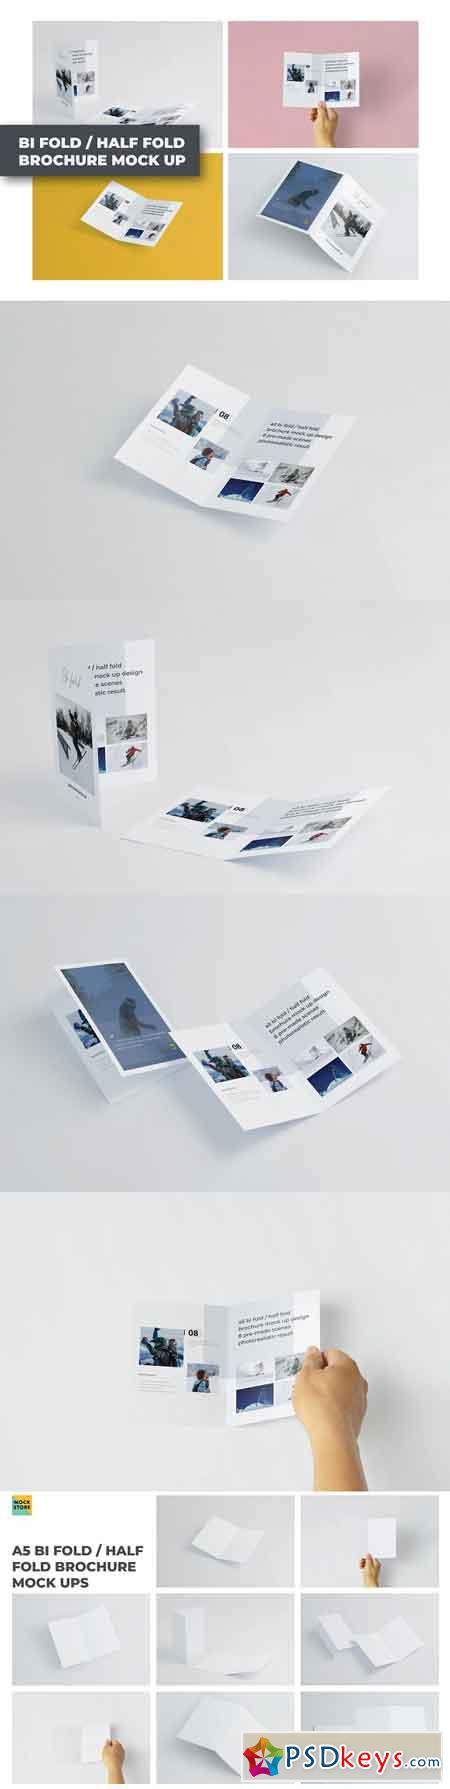 A5 Bifold Half-Fold Brochure Mockup 2564002